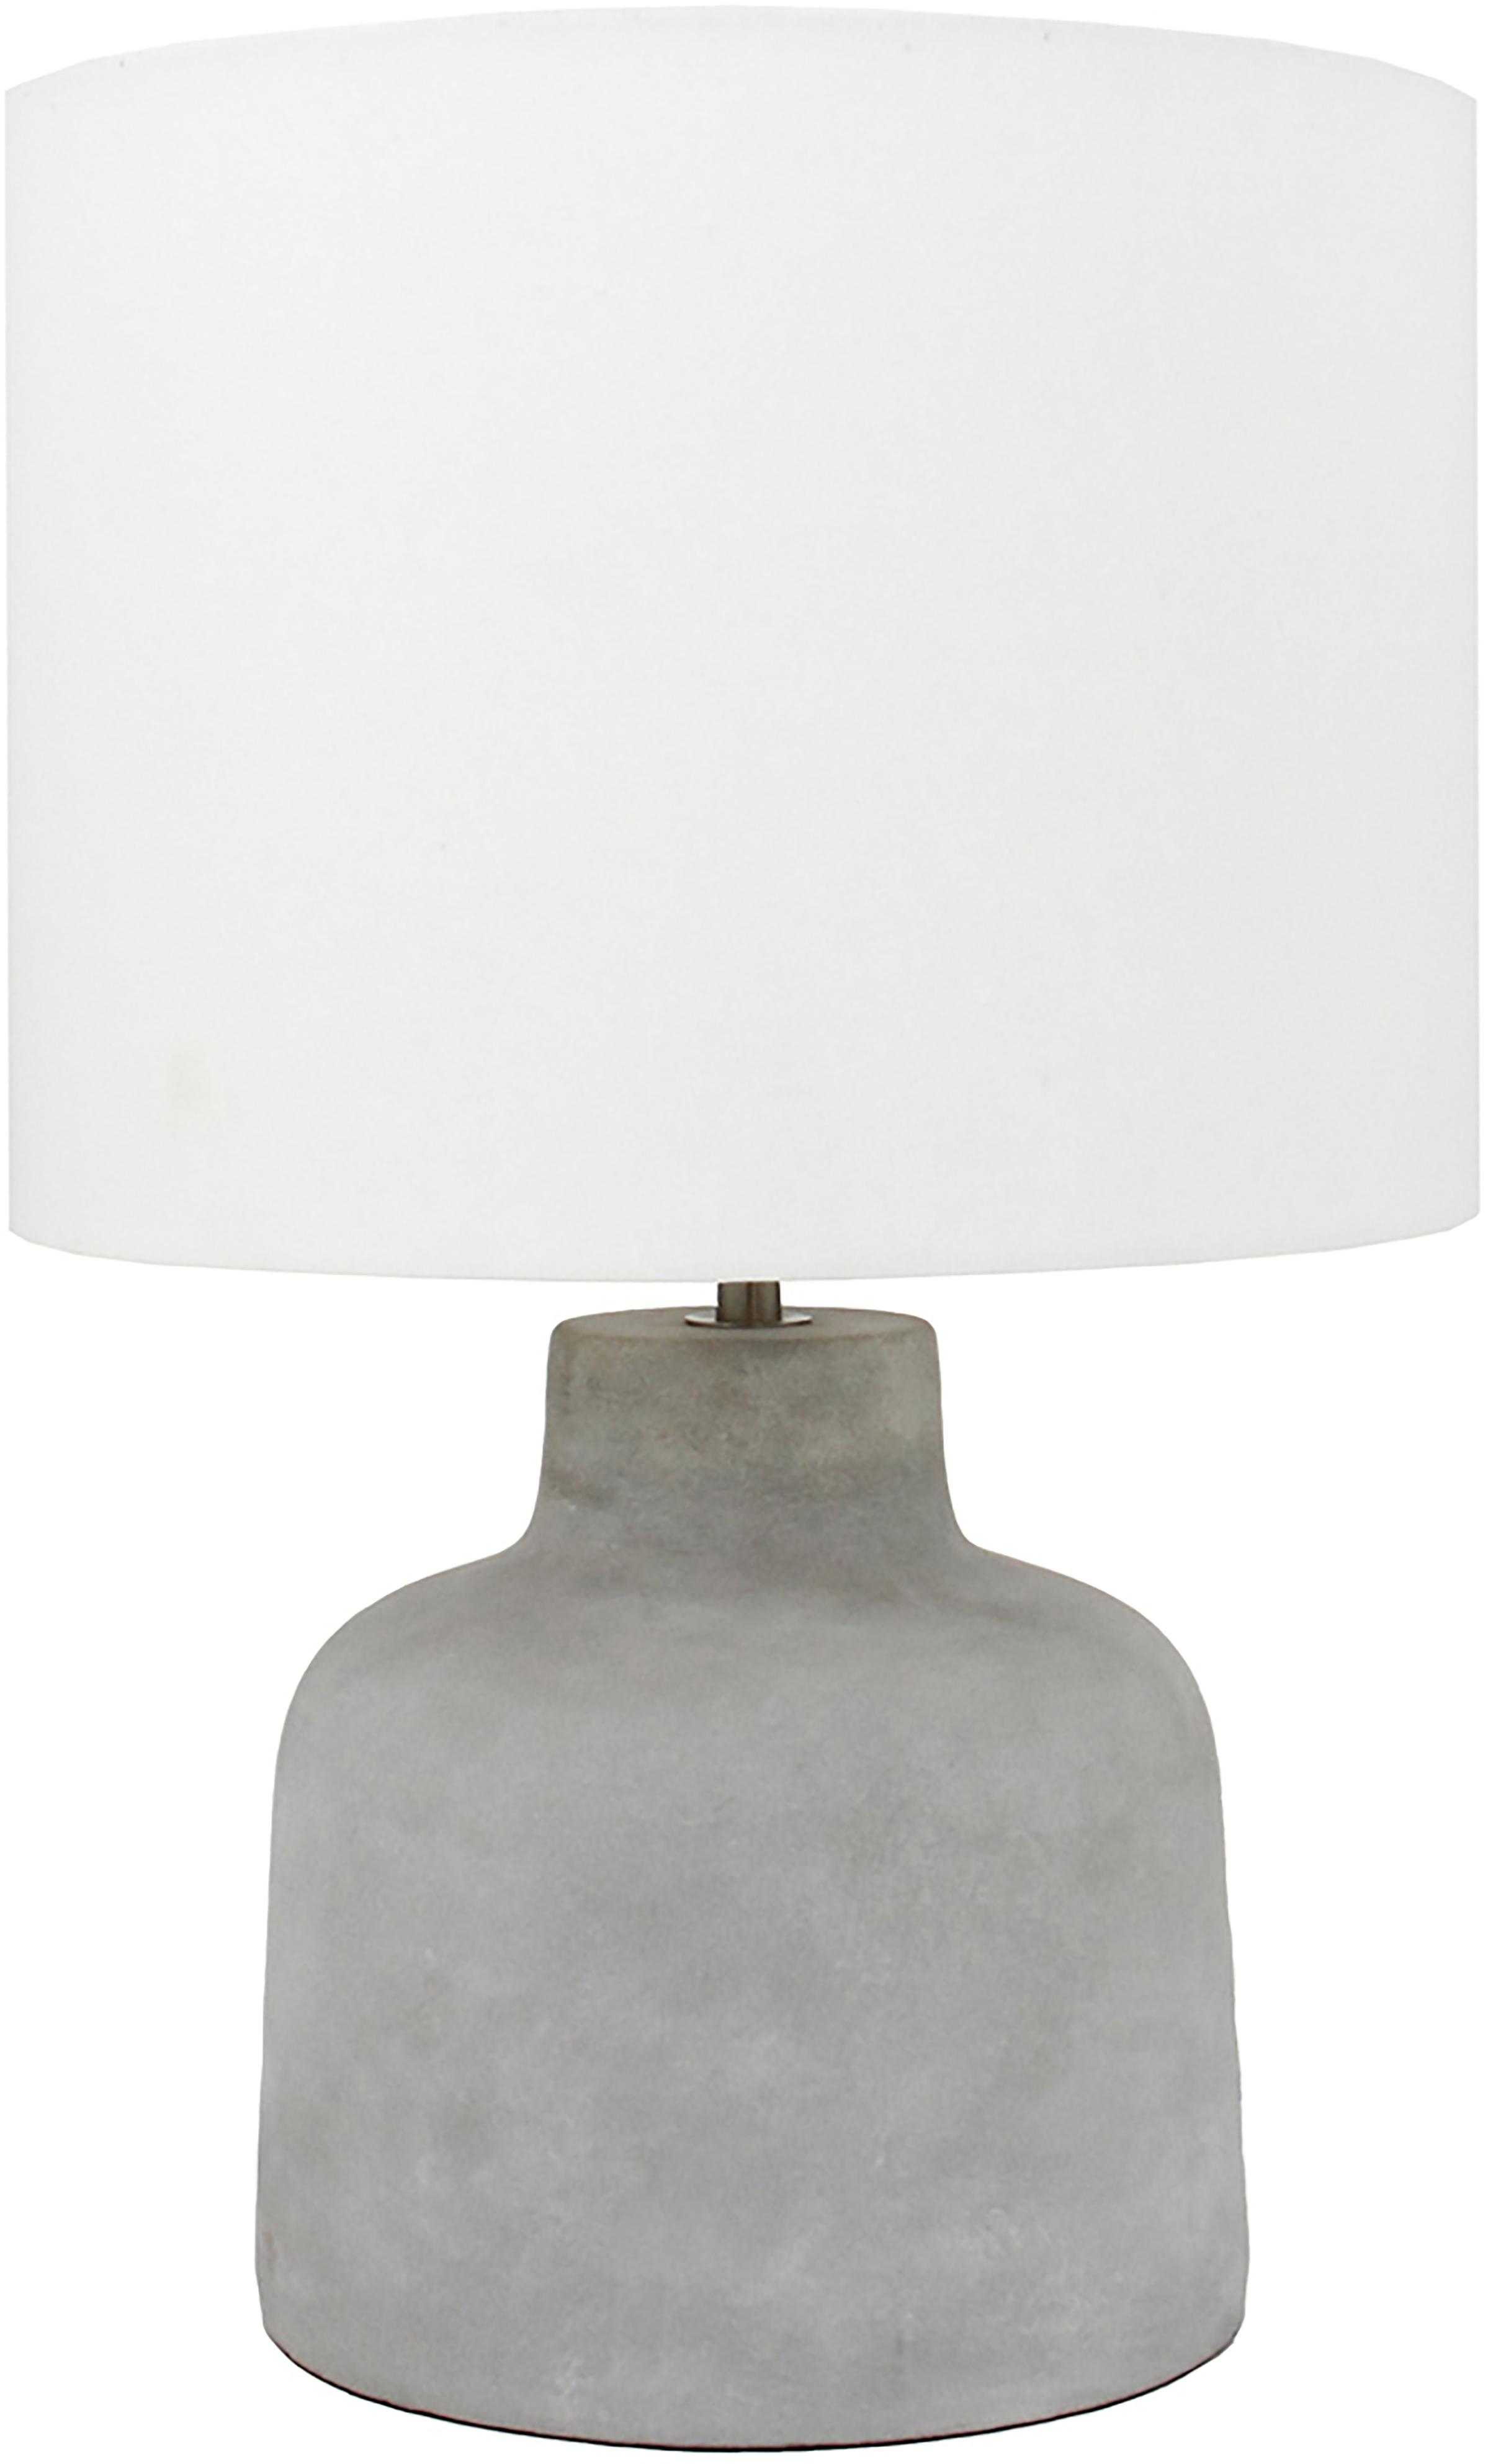 Lámpara de mesa de cemento Ike, Pantalla: 100%lino, Gris cemento, blanco, Ø 30 x Al 45 cm